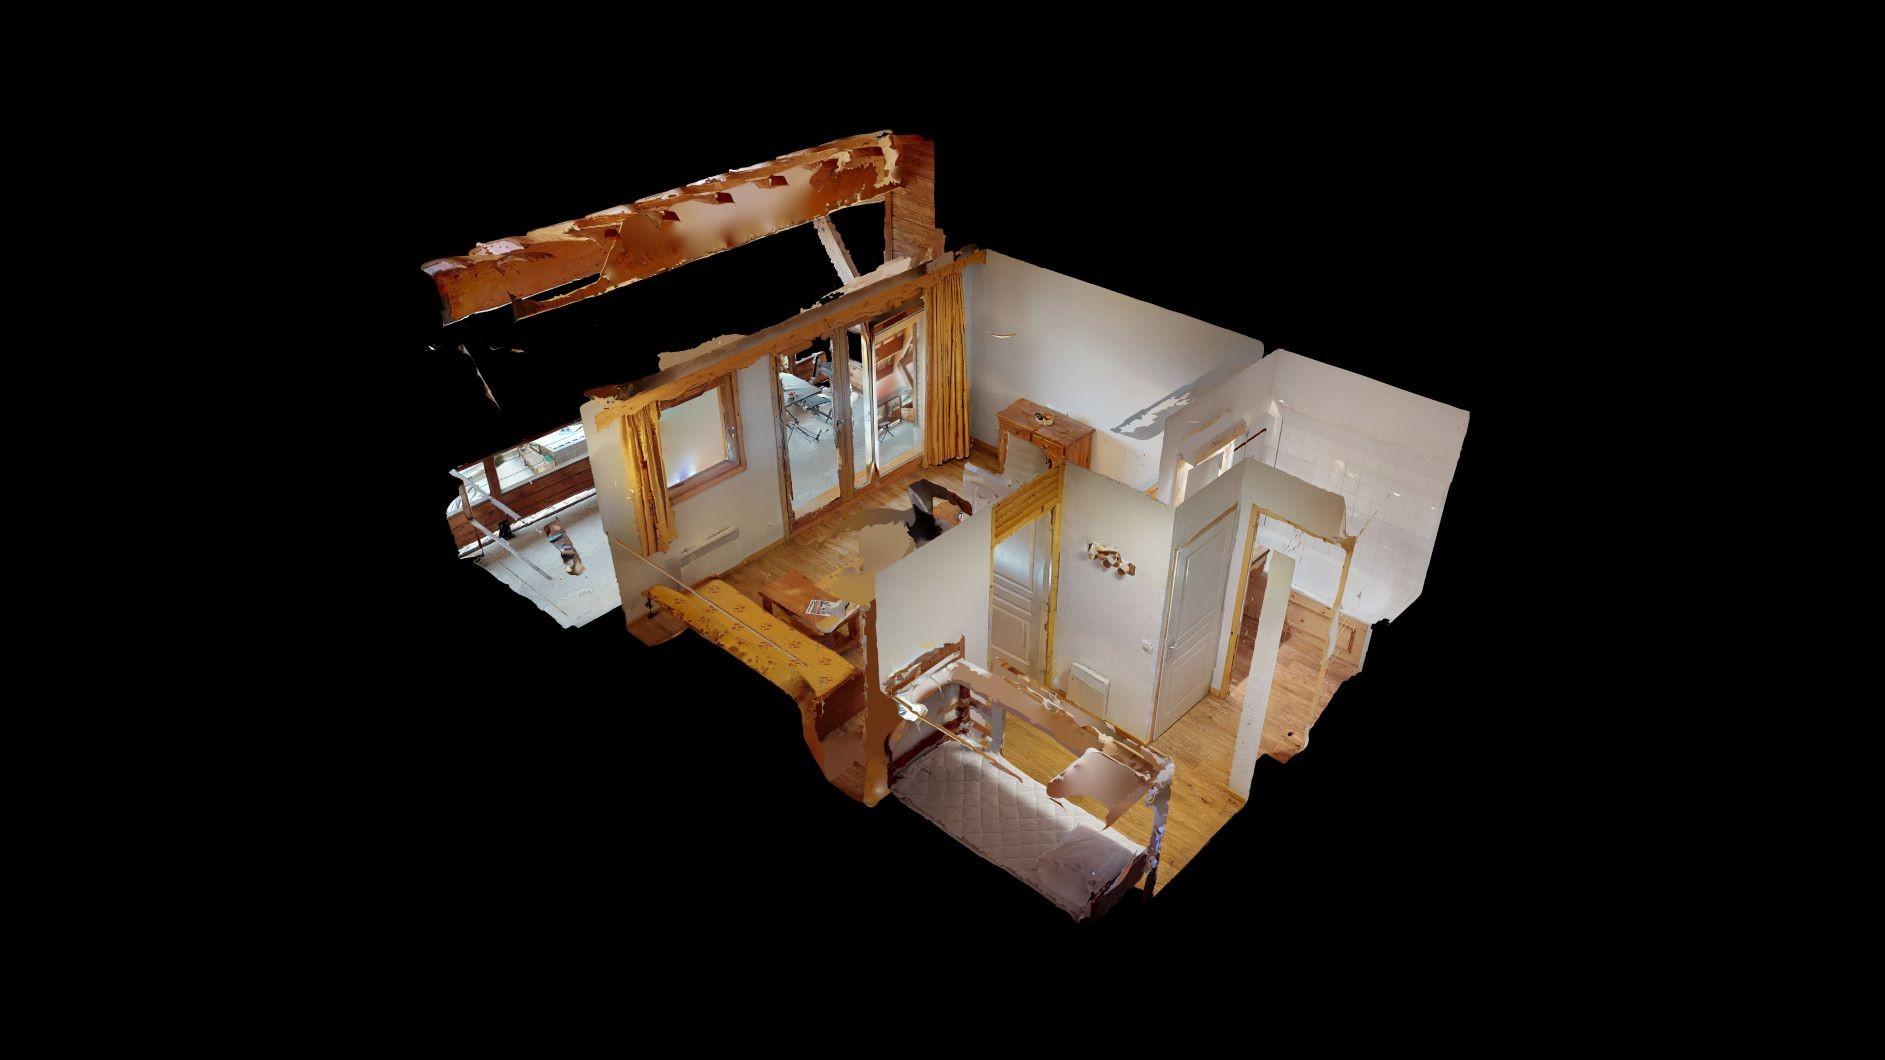 alpvision-residences-chamrousse-5-dollhouse-view-1225859